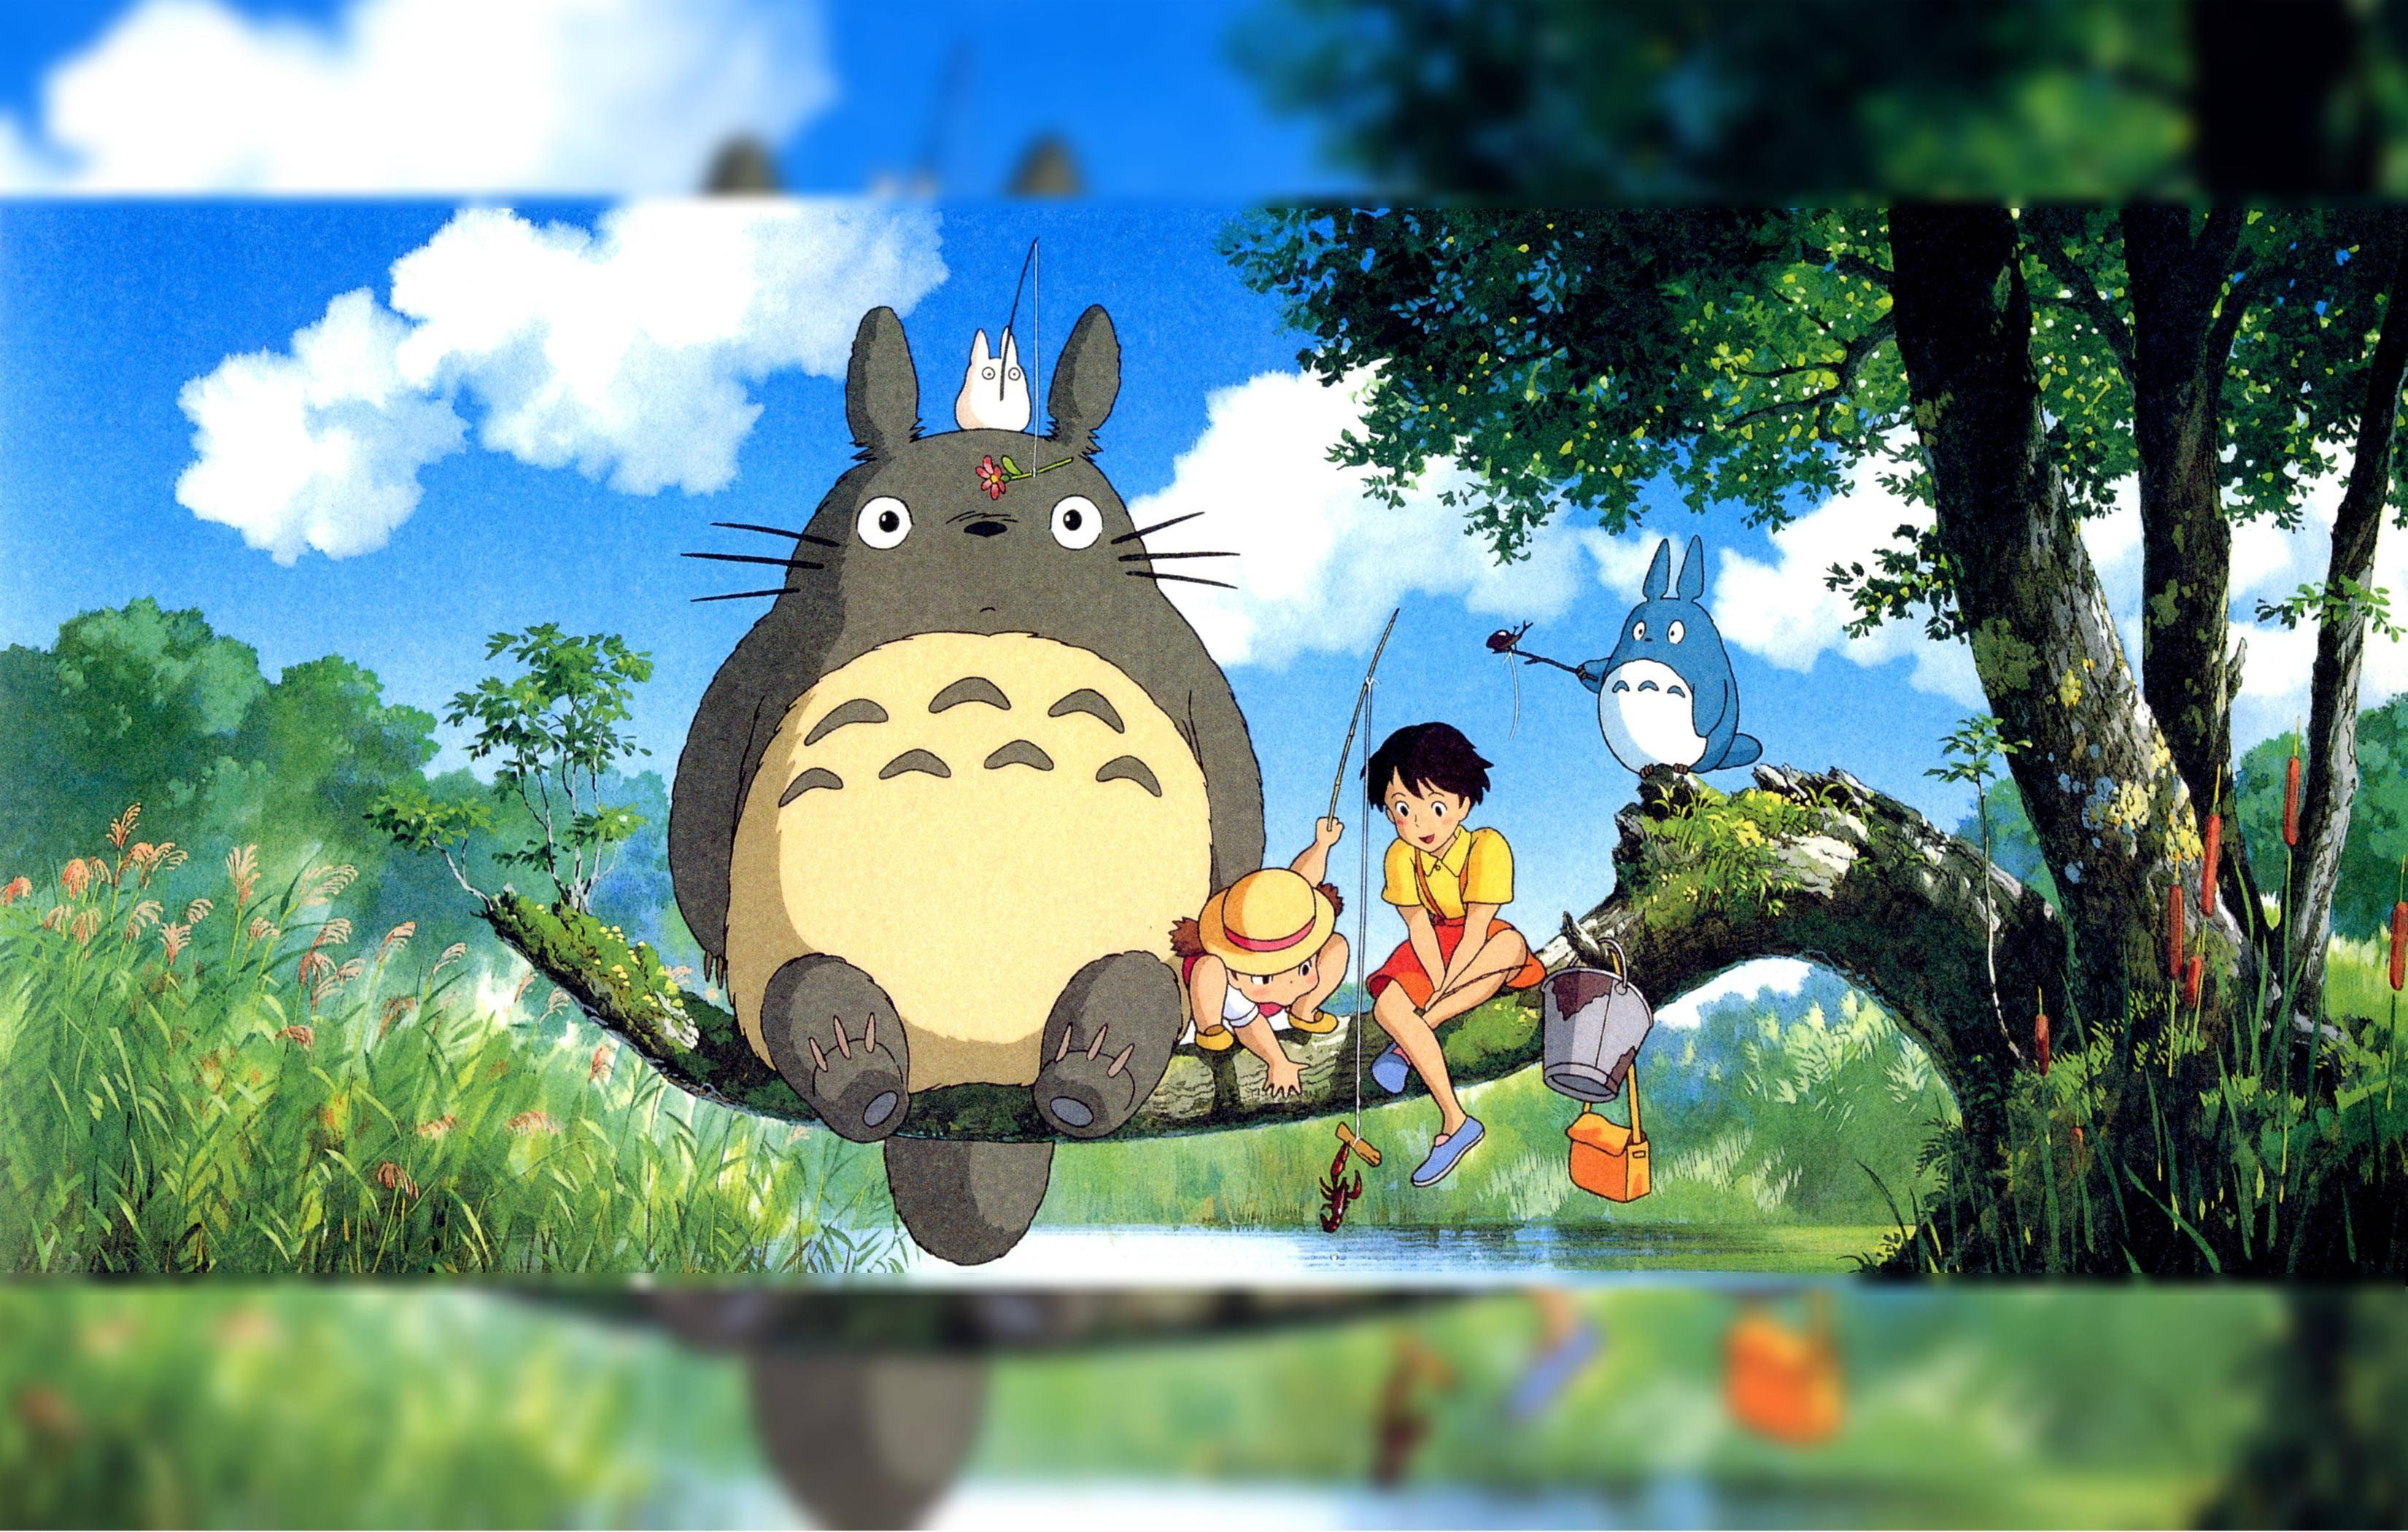 My Neighbor Totoro Wallpapers Wallpaper Cave HD Wallpapers Download Free Images Wallpaper [1000image.com]